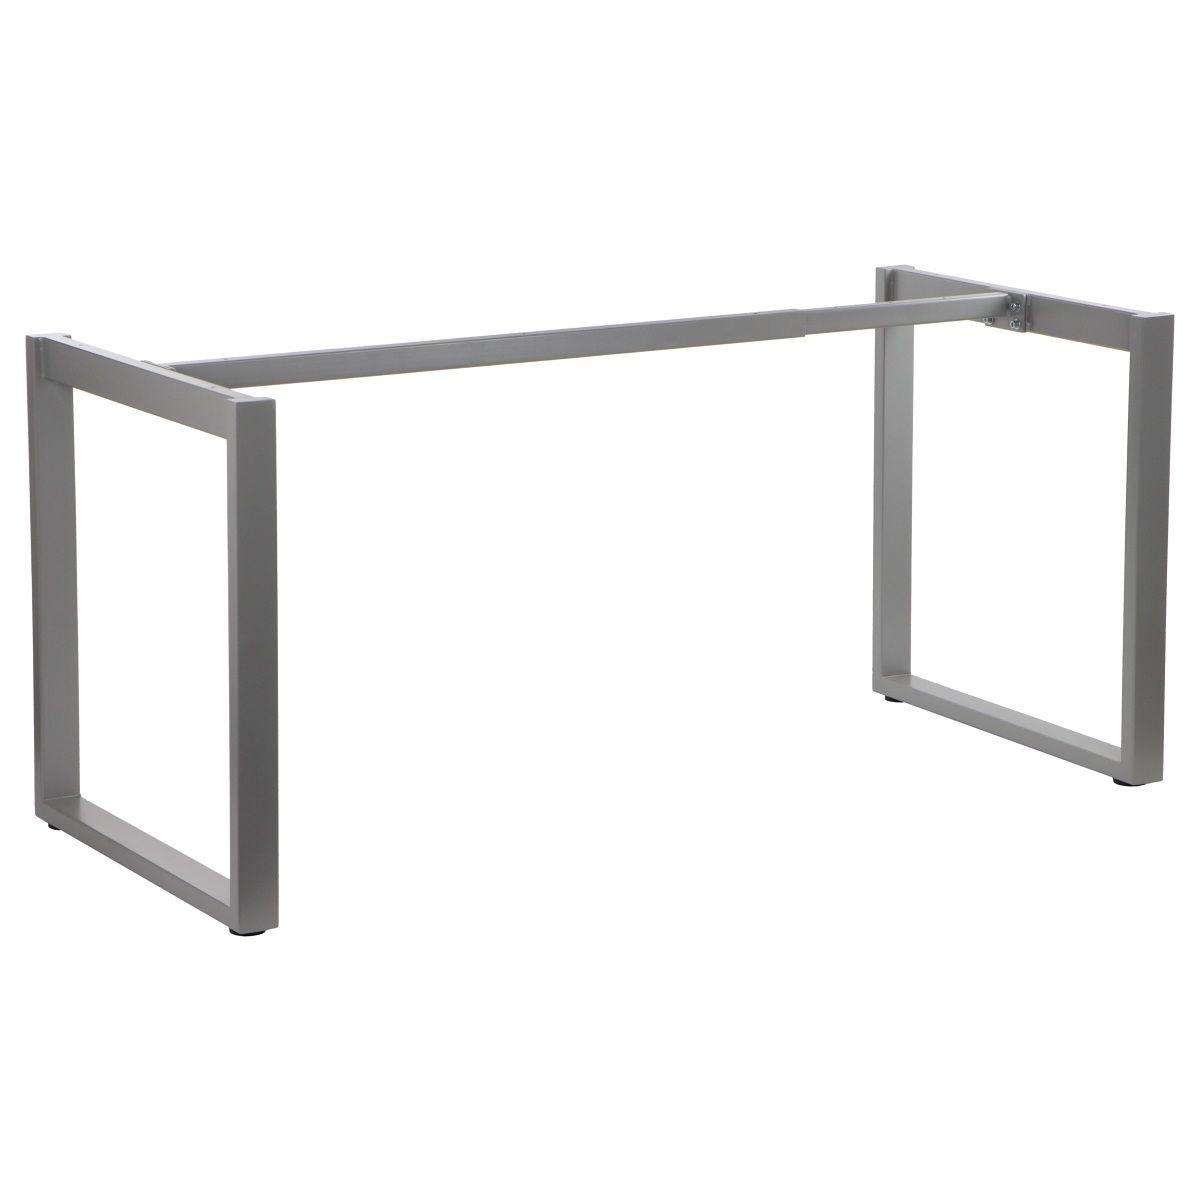 Stelaż skręcany do stołu i biurka EF-NY-131A/80 aluminium